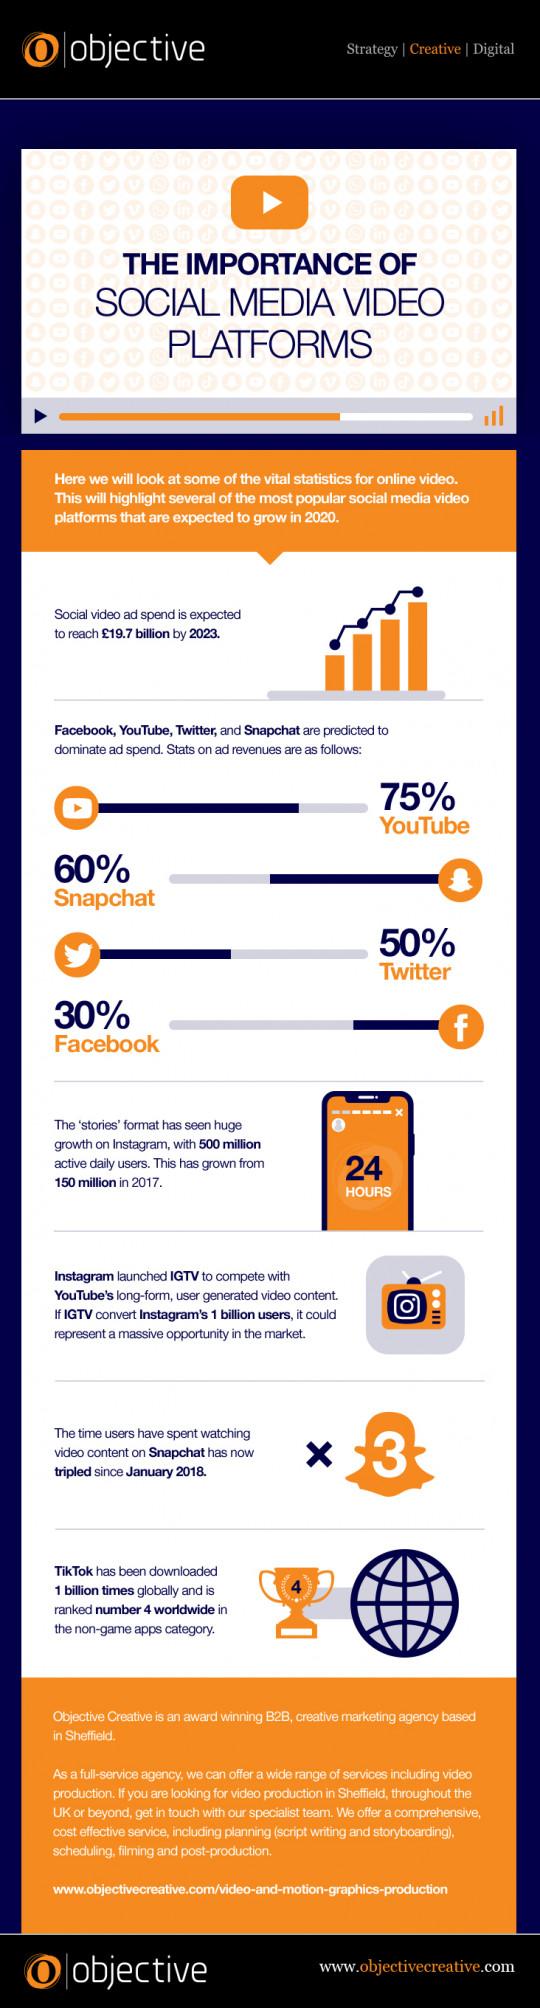 The Importance of Social Media Video Platforms